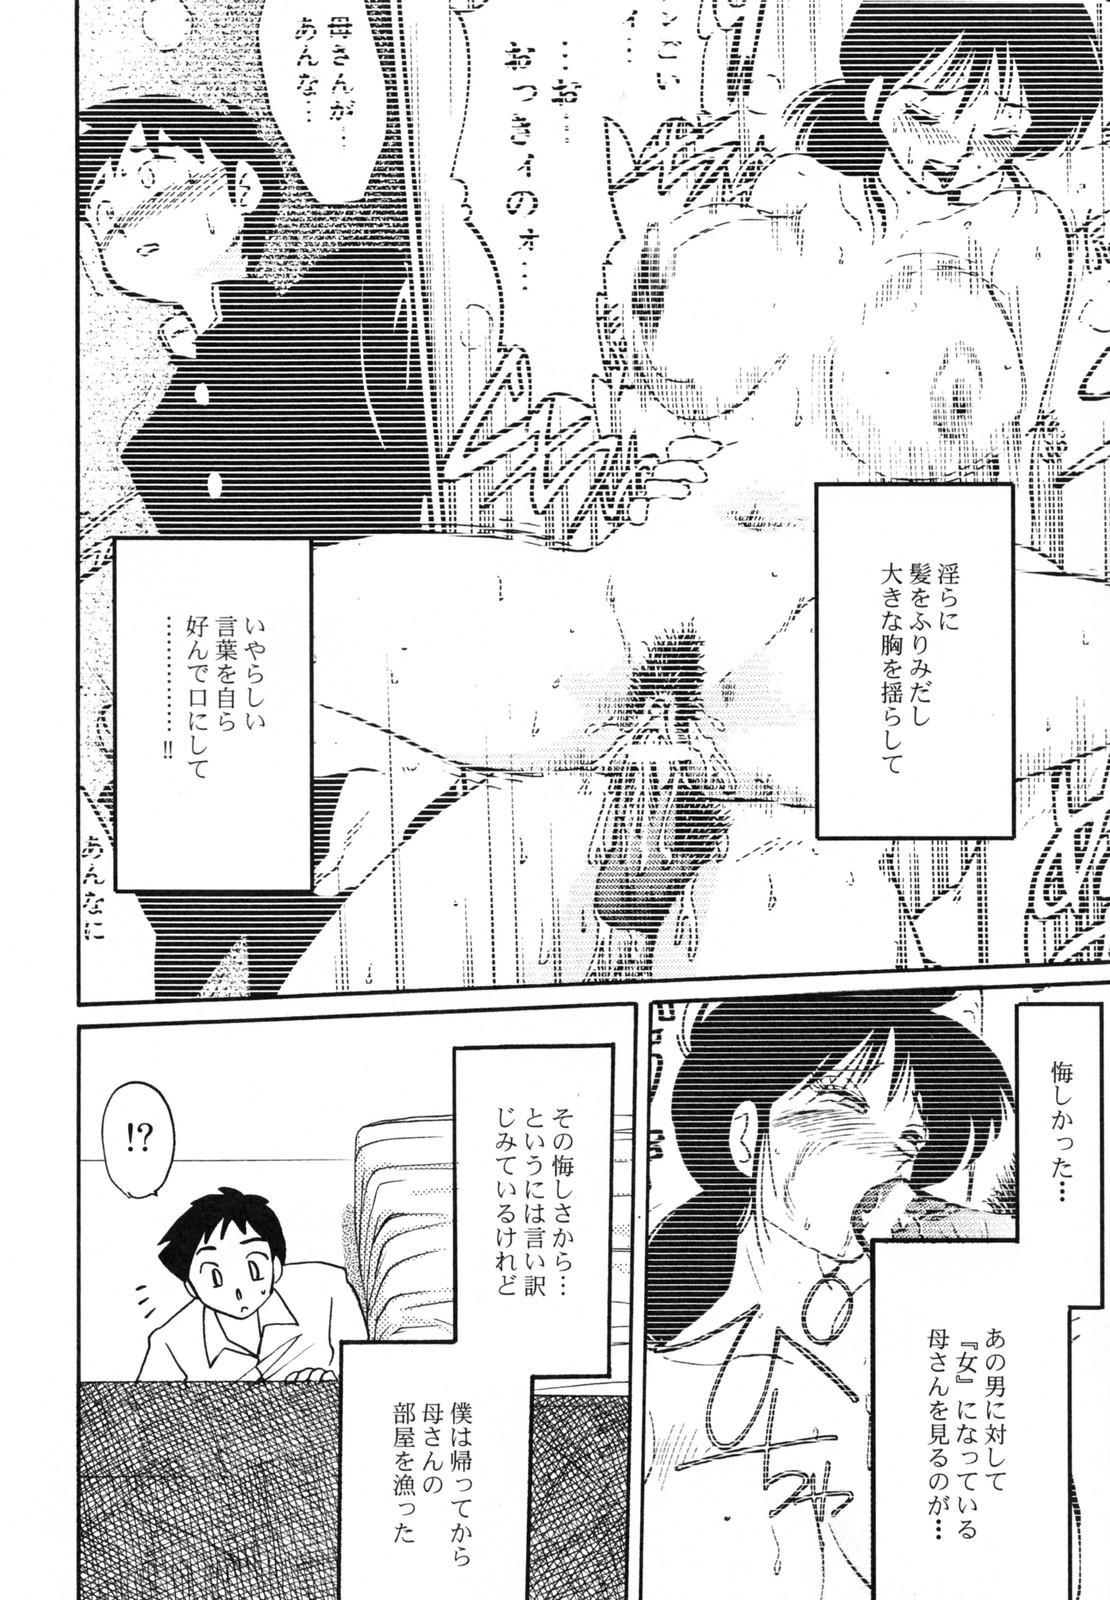 Hisae Haitoku Nikki Kanzenban Jou 73